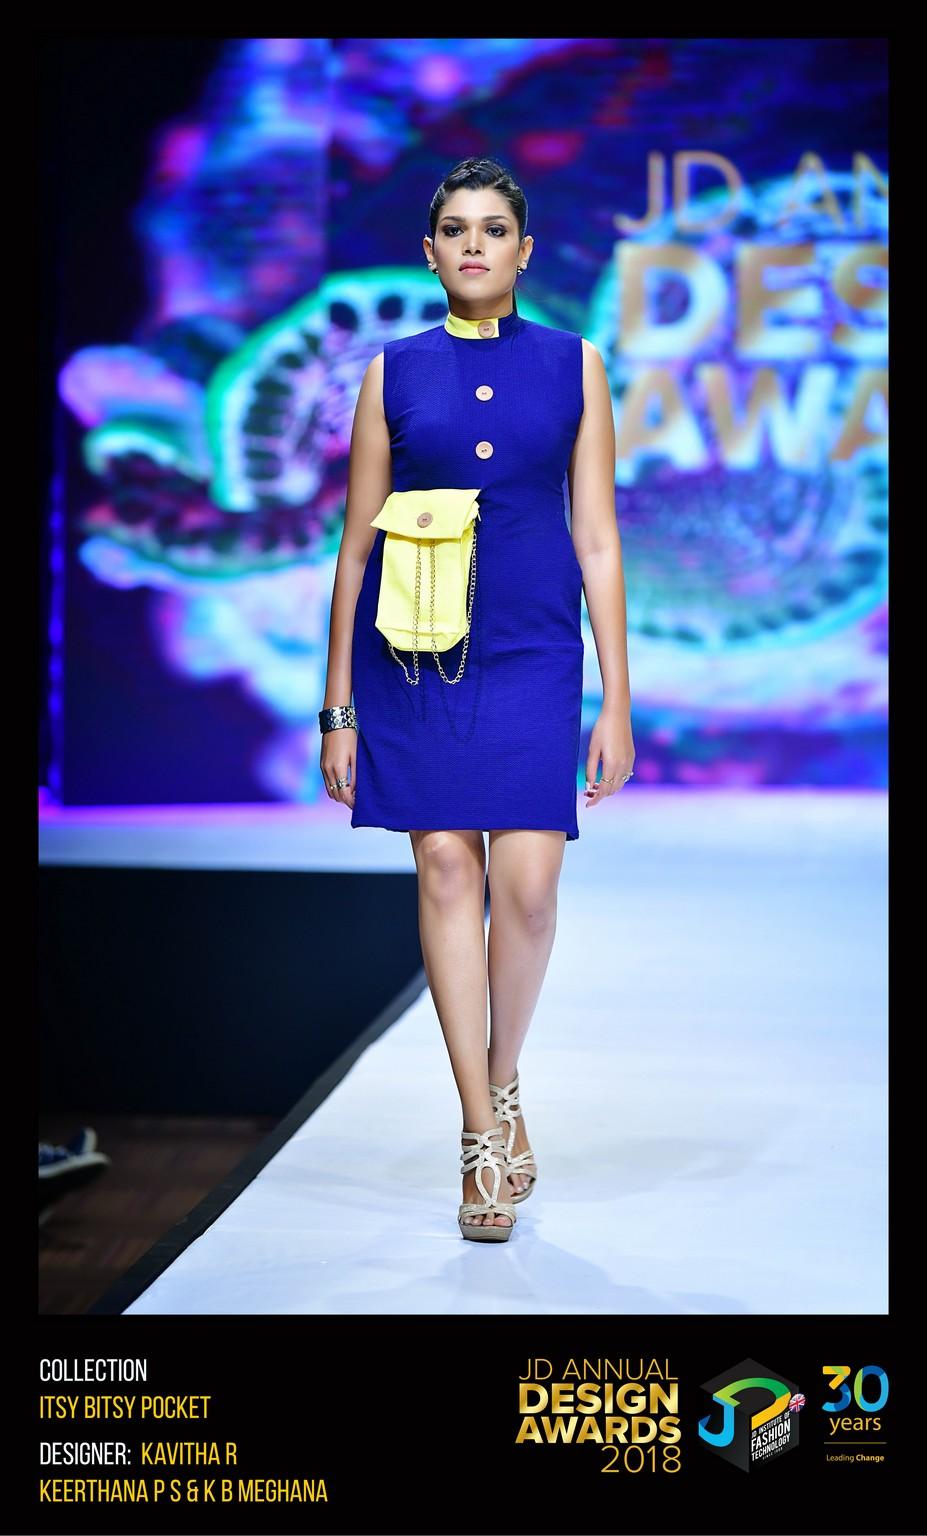 Itsy Bitsy Pocket Dress – Change – JD Annual Design Awards 2018   Designer: Kavitha, Keertana and Meghana   Photography : Jerin Nath (@jerin_nath) itsy bitsy pocket dress Itsy Bitsy Pocket Dress – Change – JD Annual Design Awards 2018 ITSY BITSY POCKET5